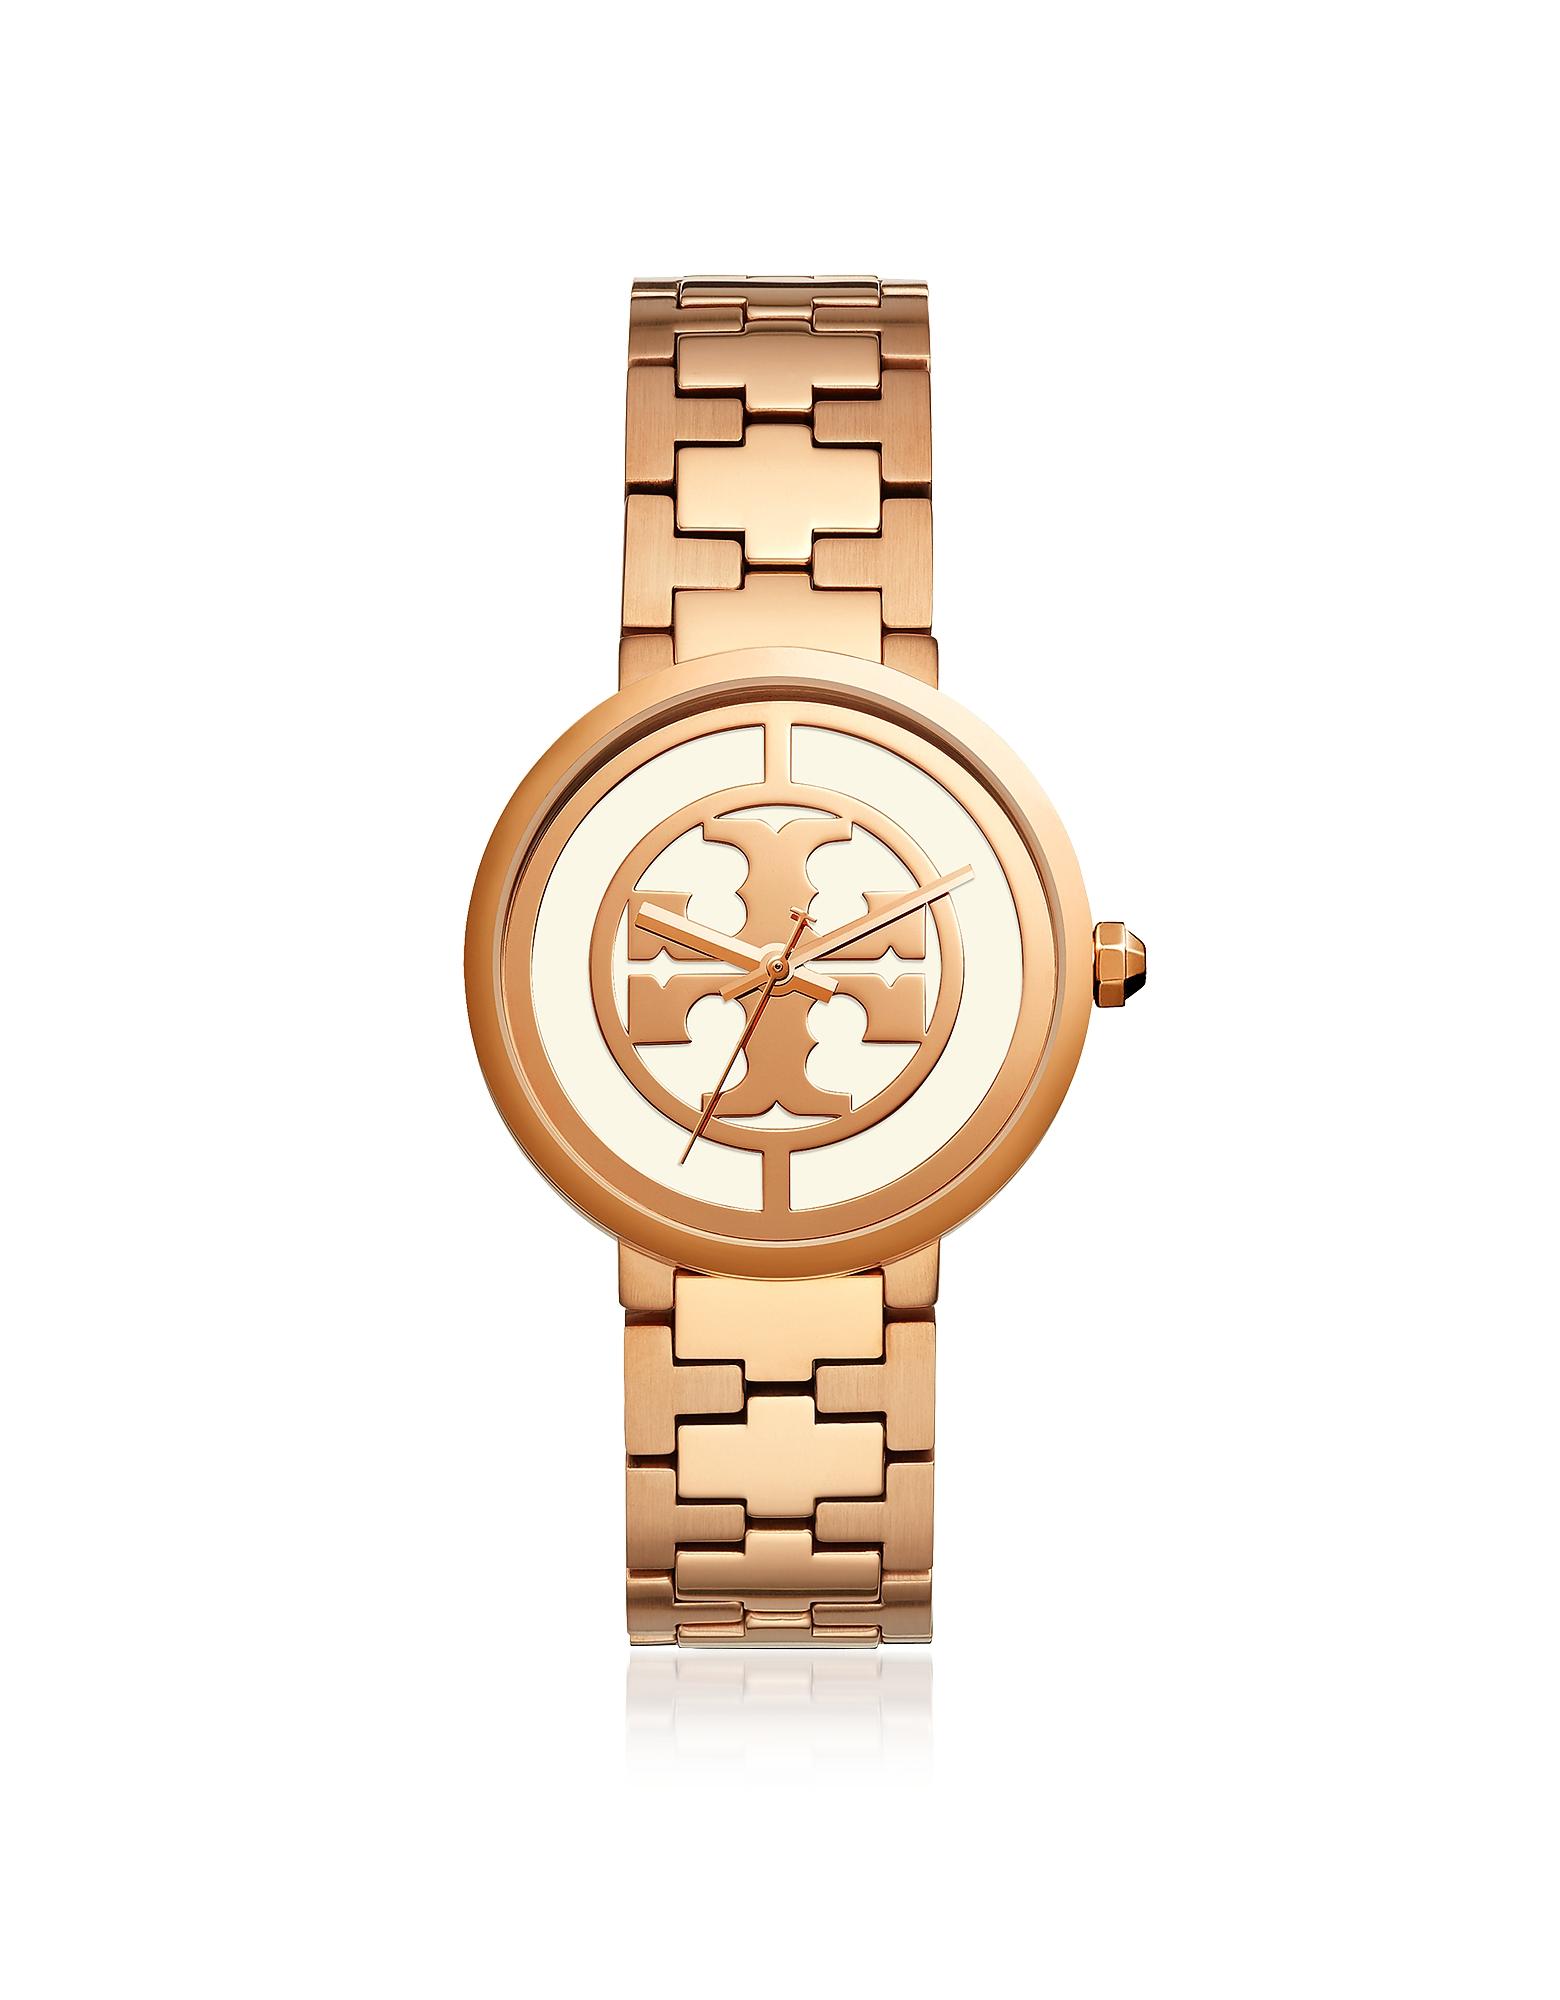 Tory Burch Women's Watches, TBW4028 The Reva Rose Gold 36mm Women's Watch